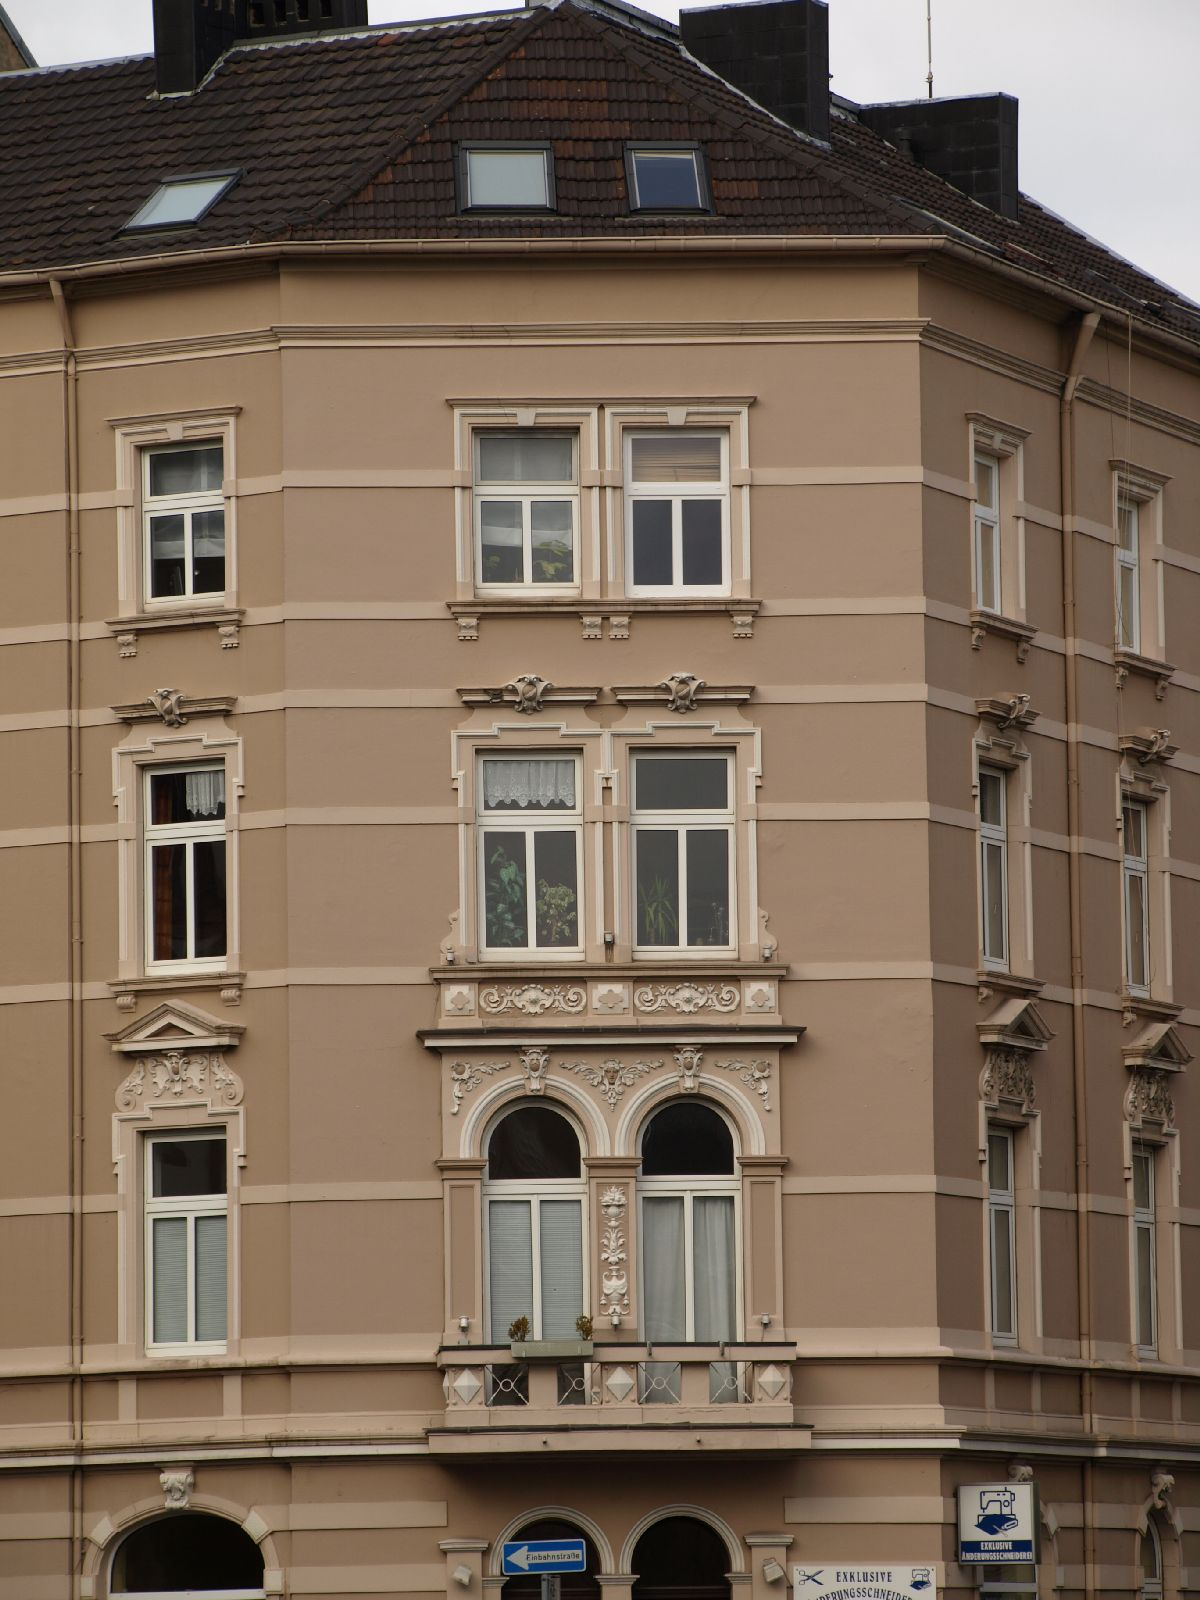 Gebaeude-Architektur_Textur_A_PA039911